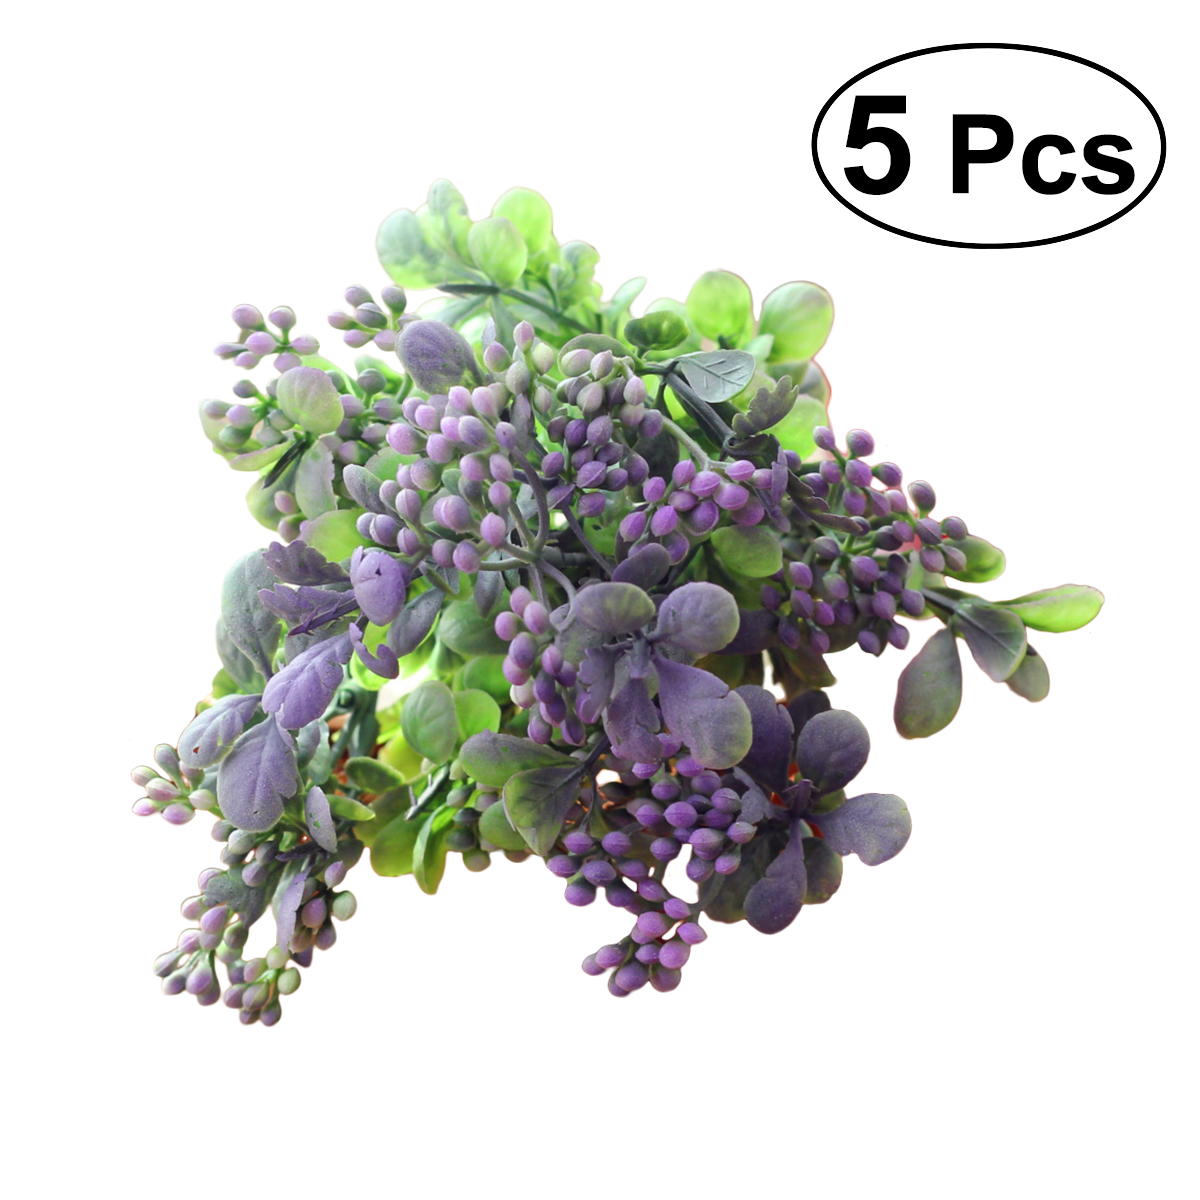 5pcs Artificial Lifelike Berries Fake Mini Berries Simulation Decorative Fruit Plants (Blue)